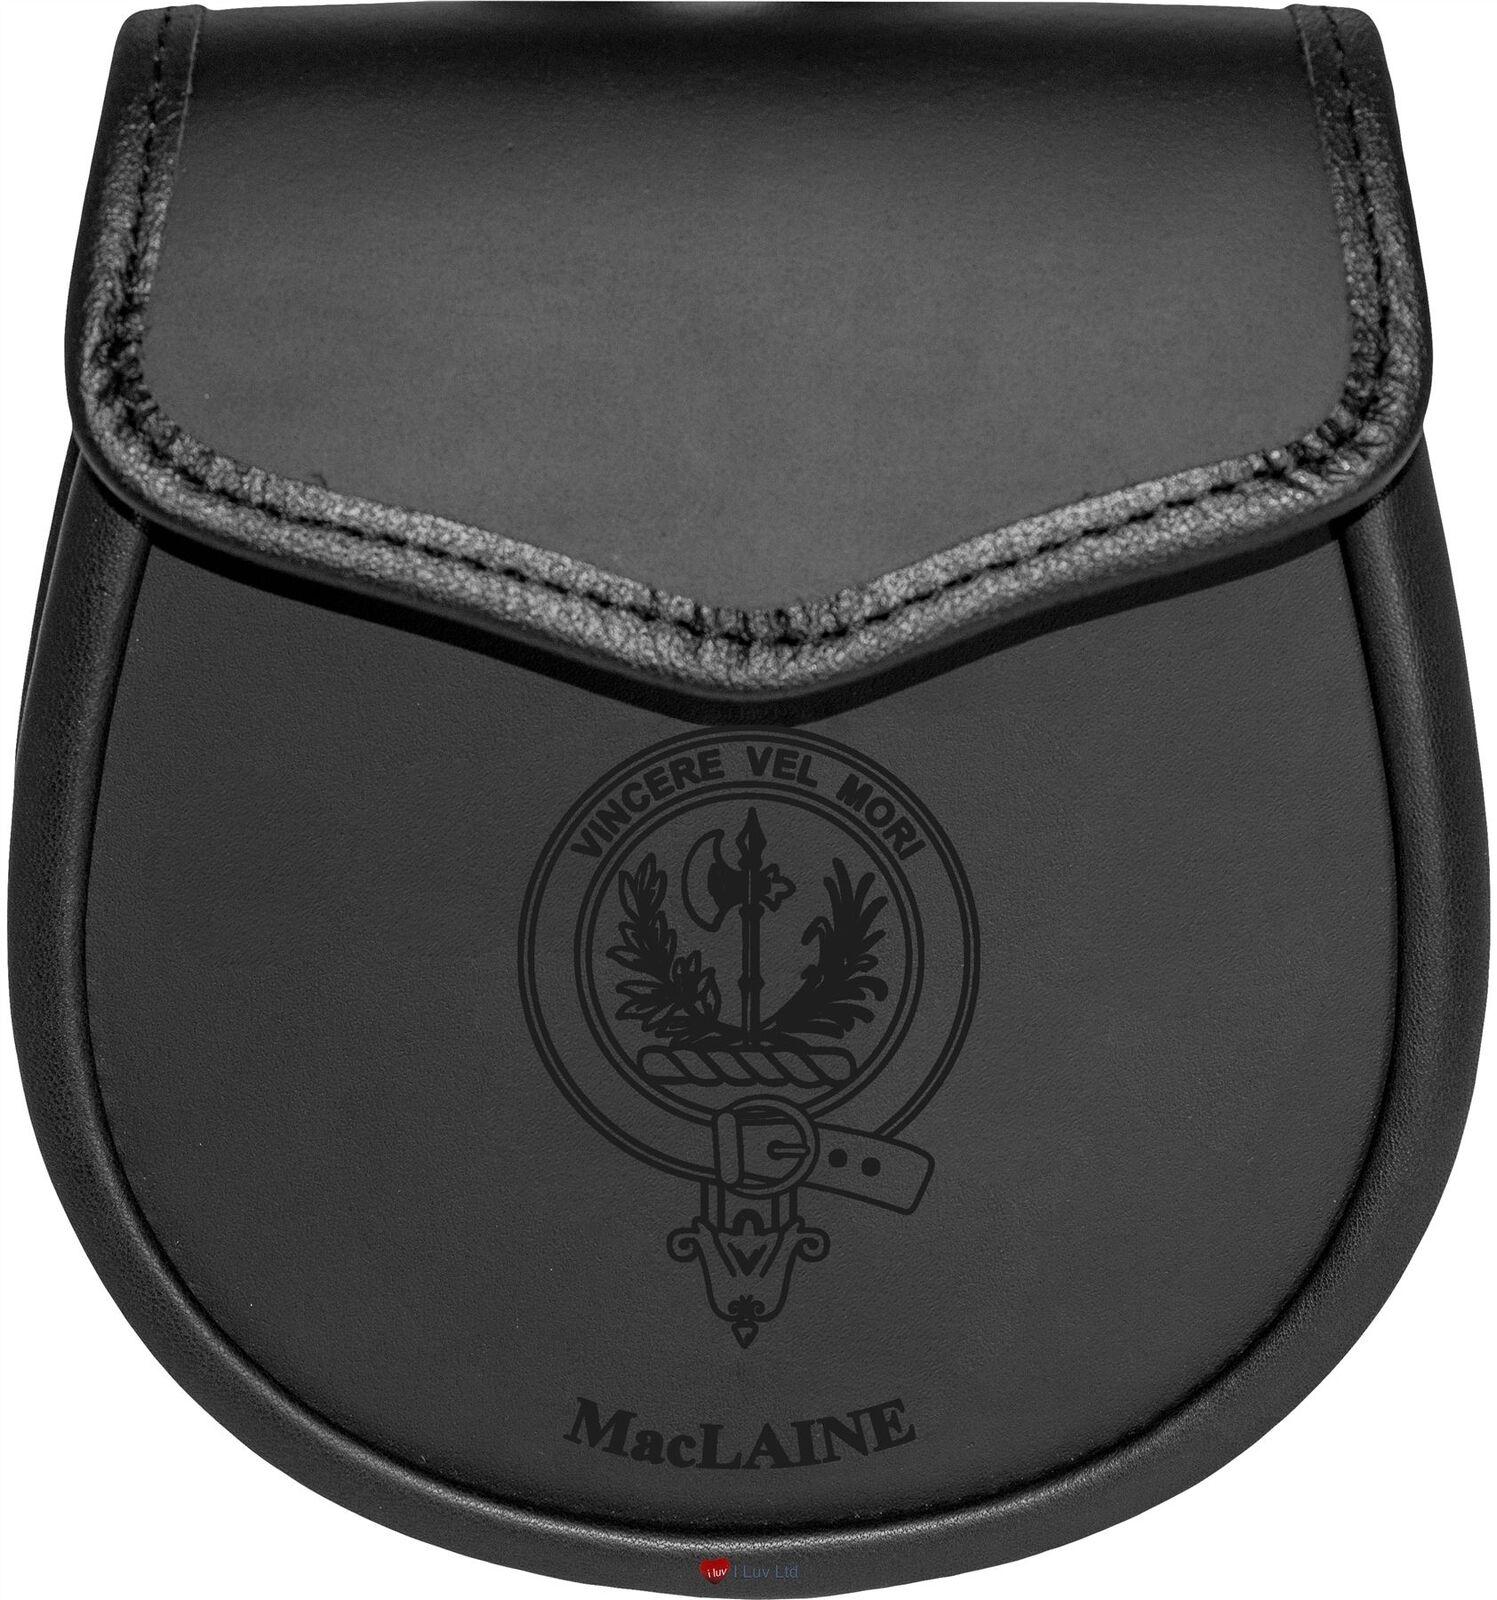 MacLaine Leather Day Sporran Scottish Clan Crest